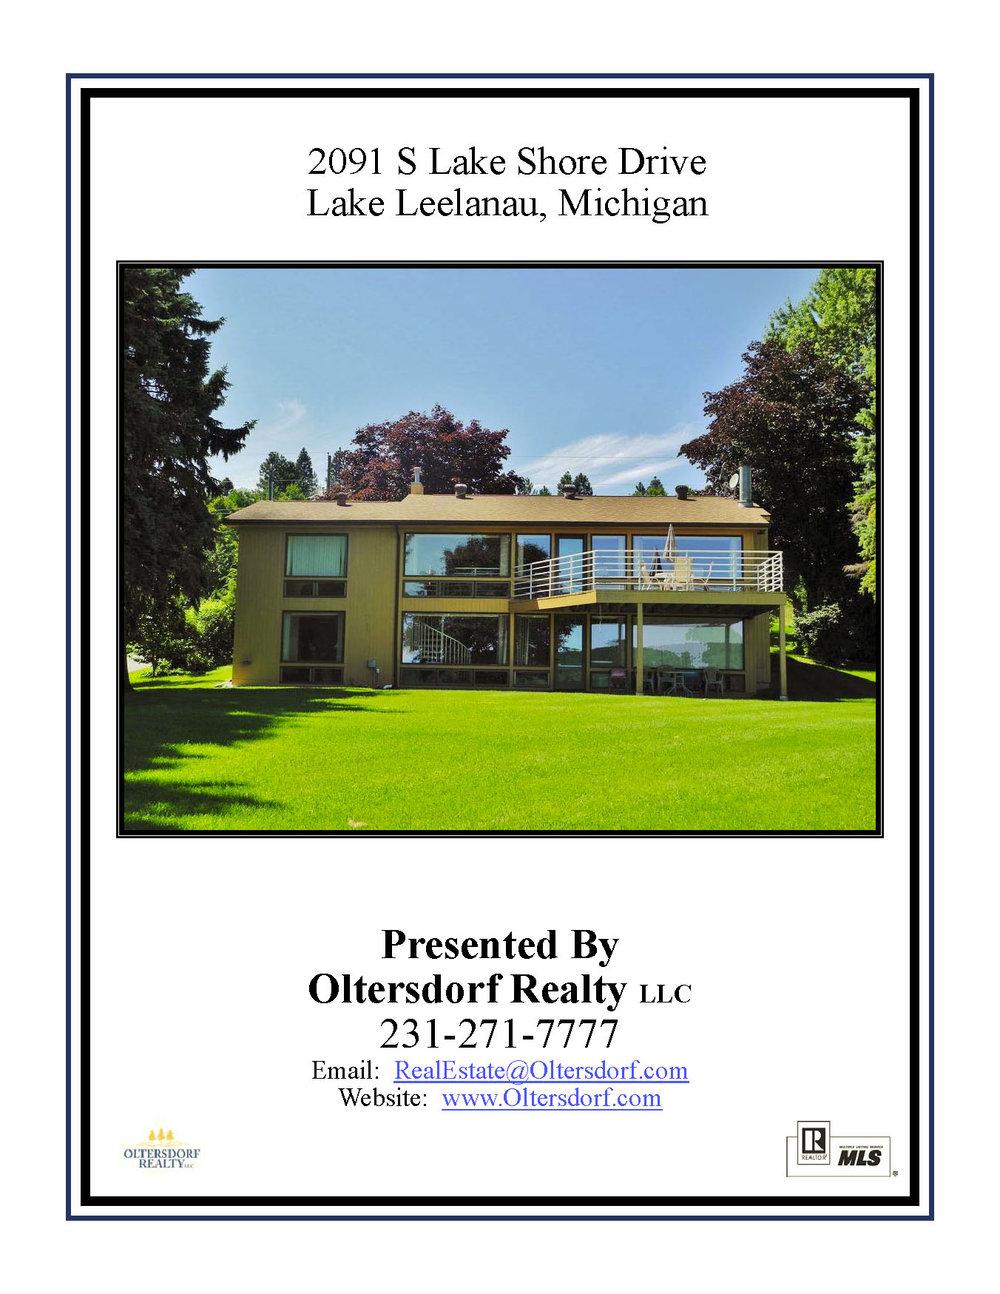 2091 S Lake Shore Drive - Oltersdorf Realty LLC Marketing Packet_Page_01.jpg